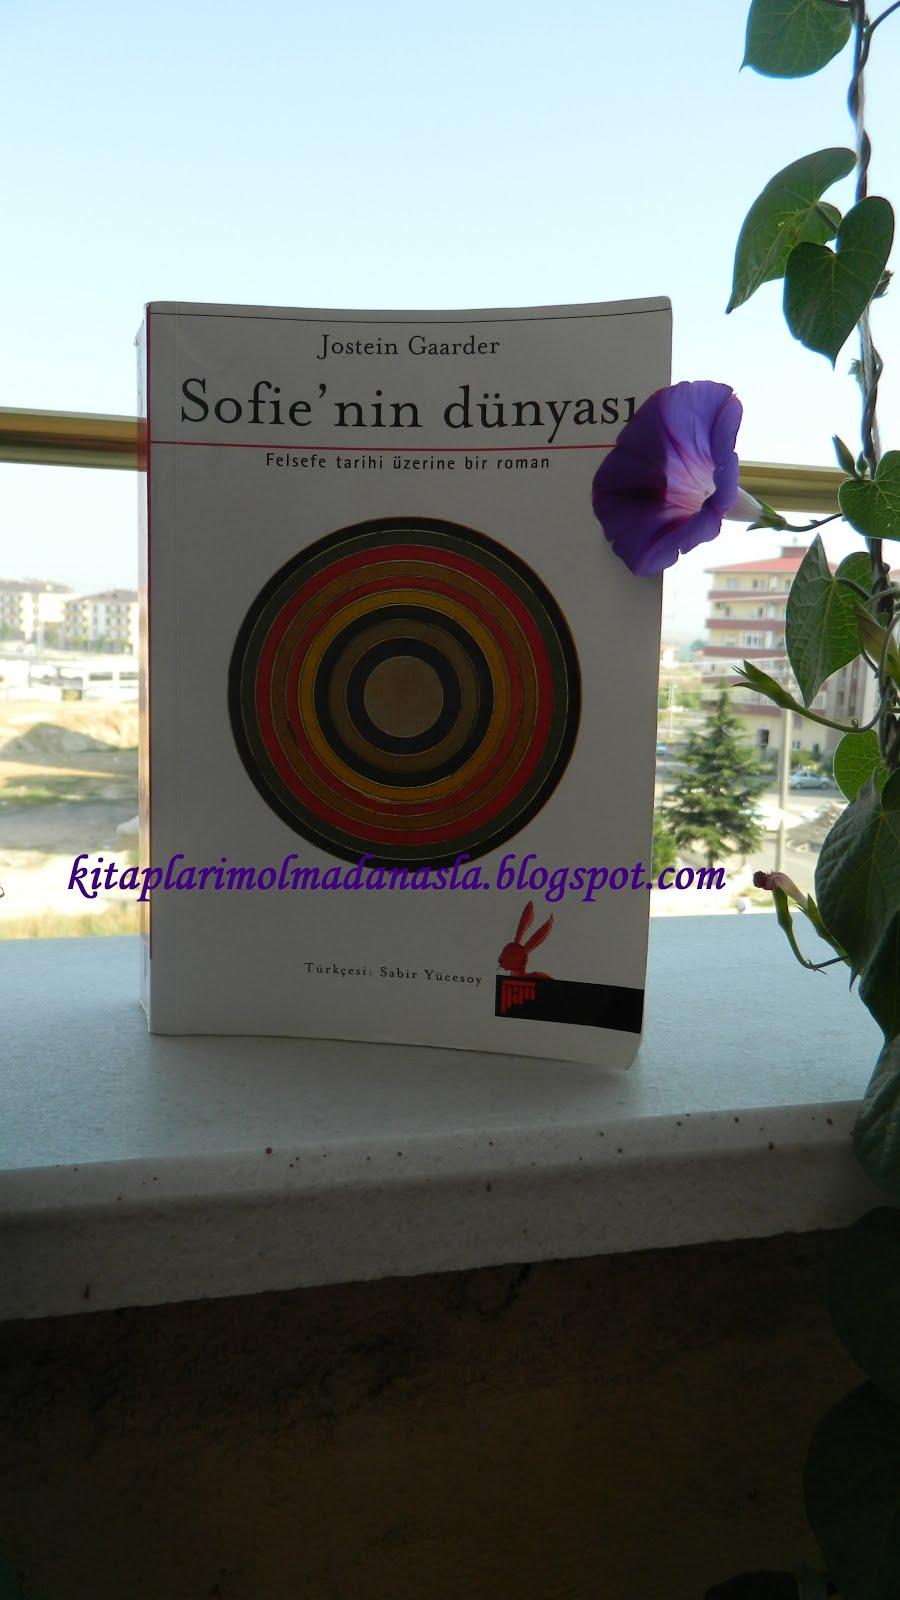 JOSTEİN GAARDER - SOFİE'NİN DÜNYASI